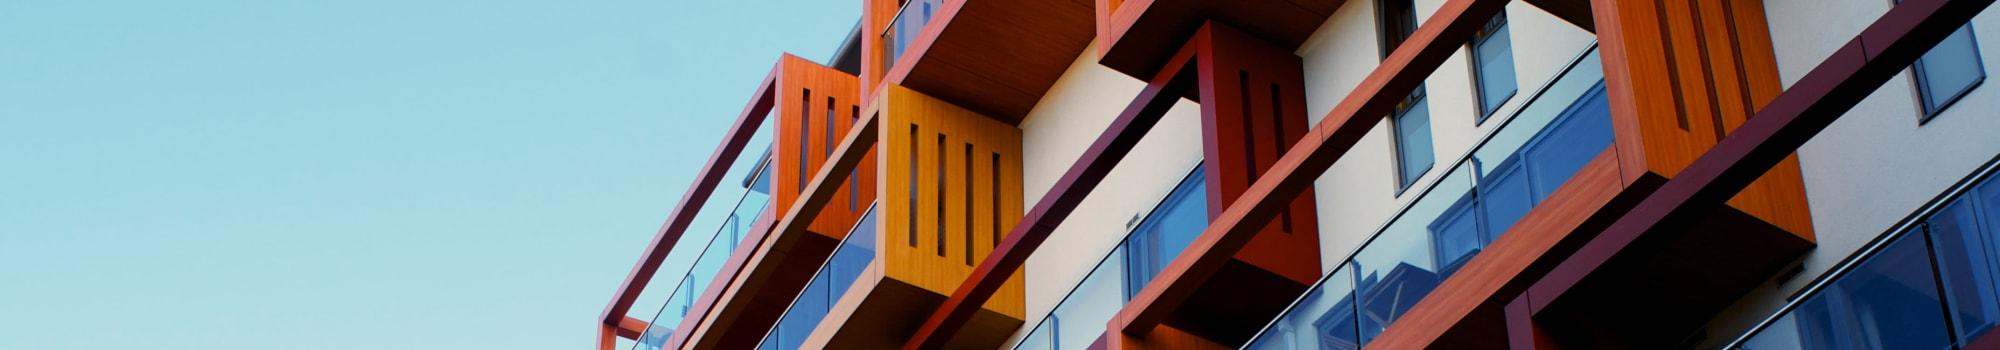 Maintenance Request of Glenburn Apartments in Cambridge, Maryland